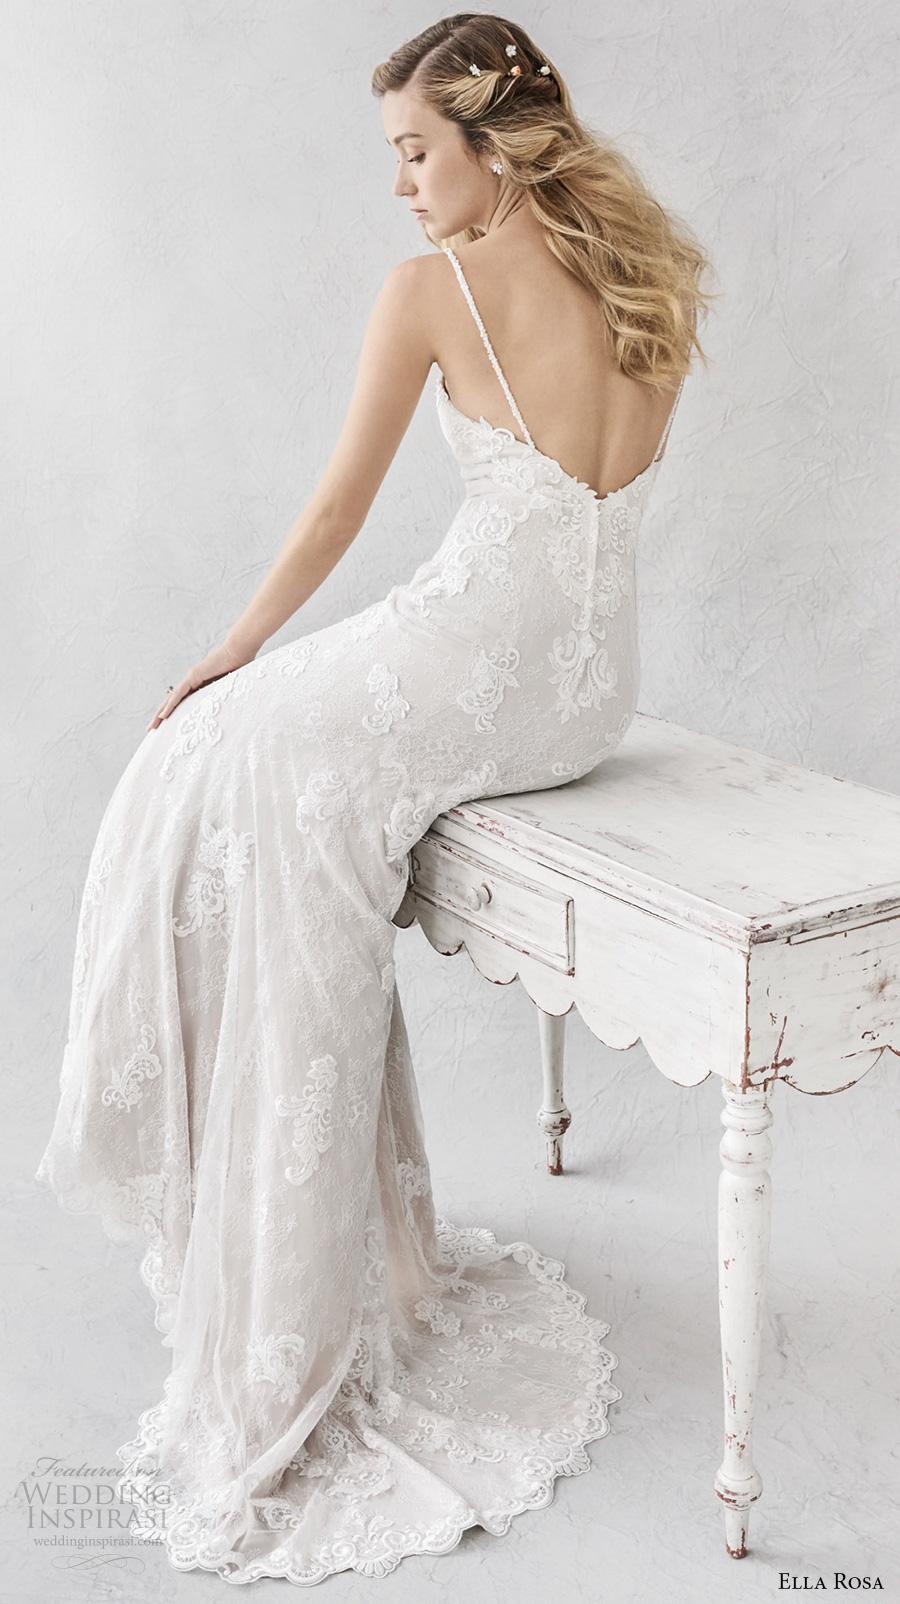 ella rosa spring 2017 bridal spagetti strap sweetheart neckline full embellishment romantic elegant fit and flare wedding dress open back sweep train (380) bv